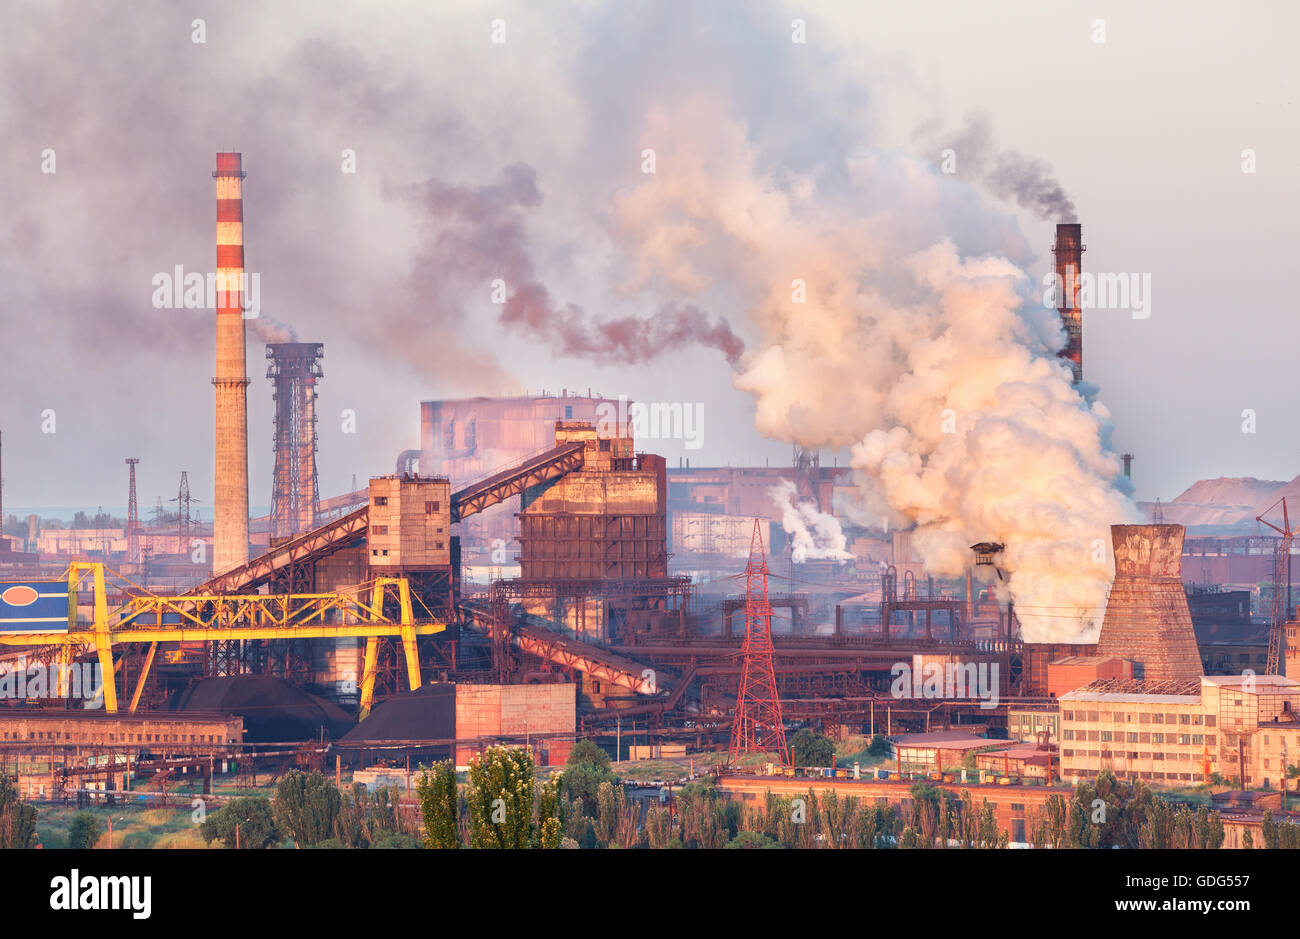 Paesaggio industriale in Ucraina Fabbrica di acciaio al